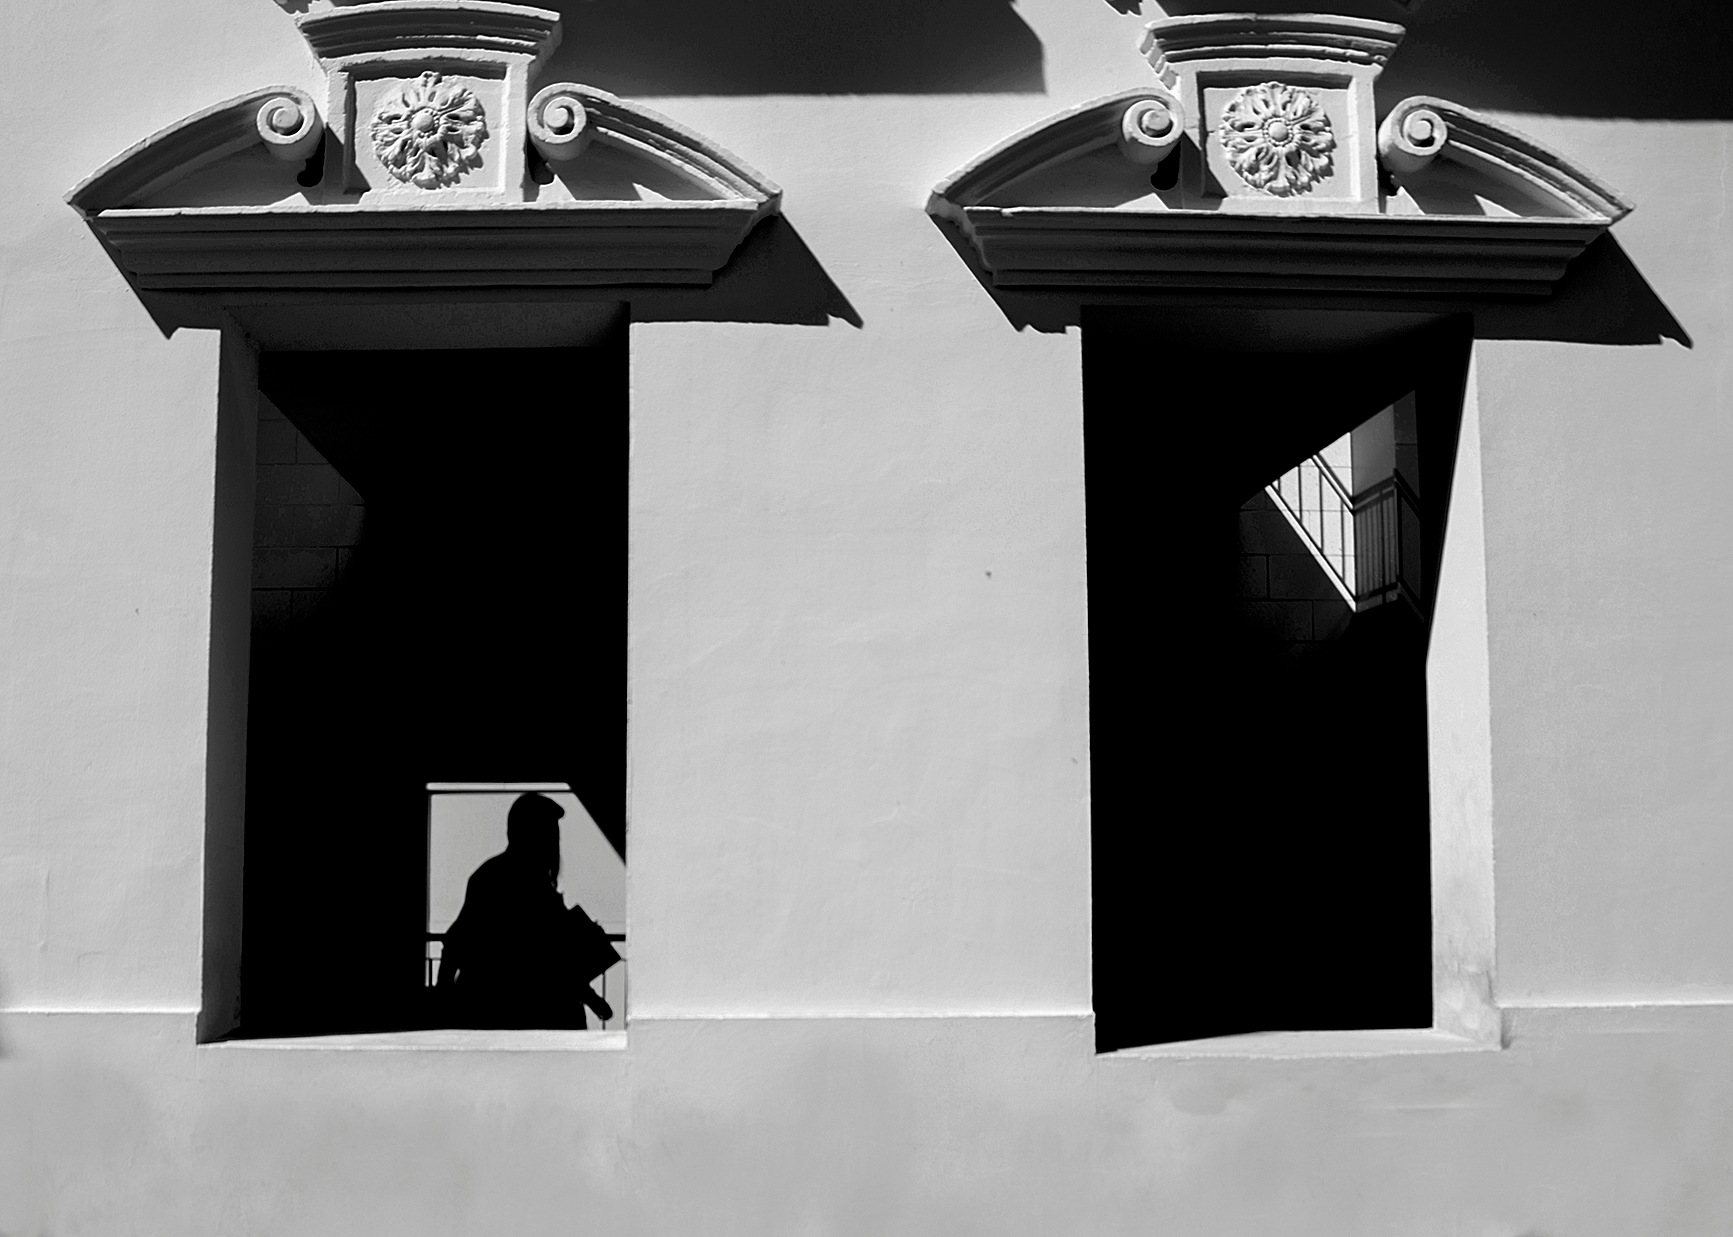 Two windows by aniceto.moreno.94